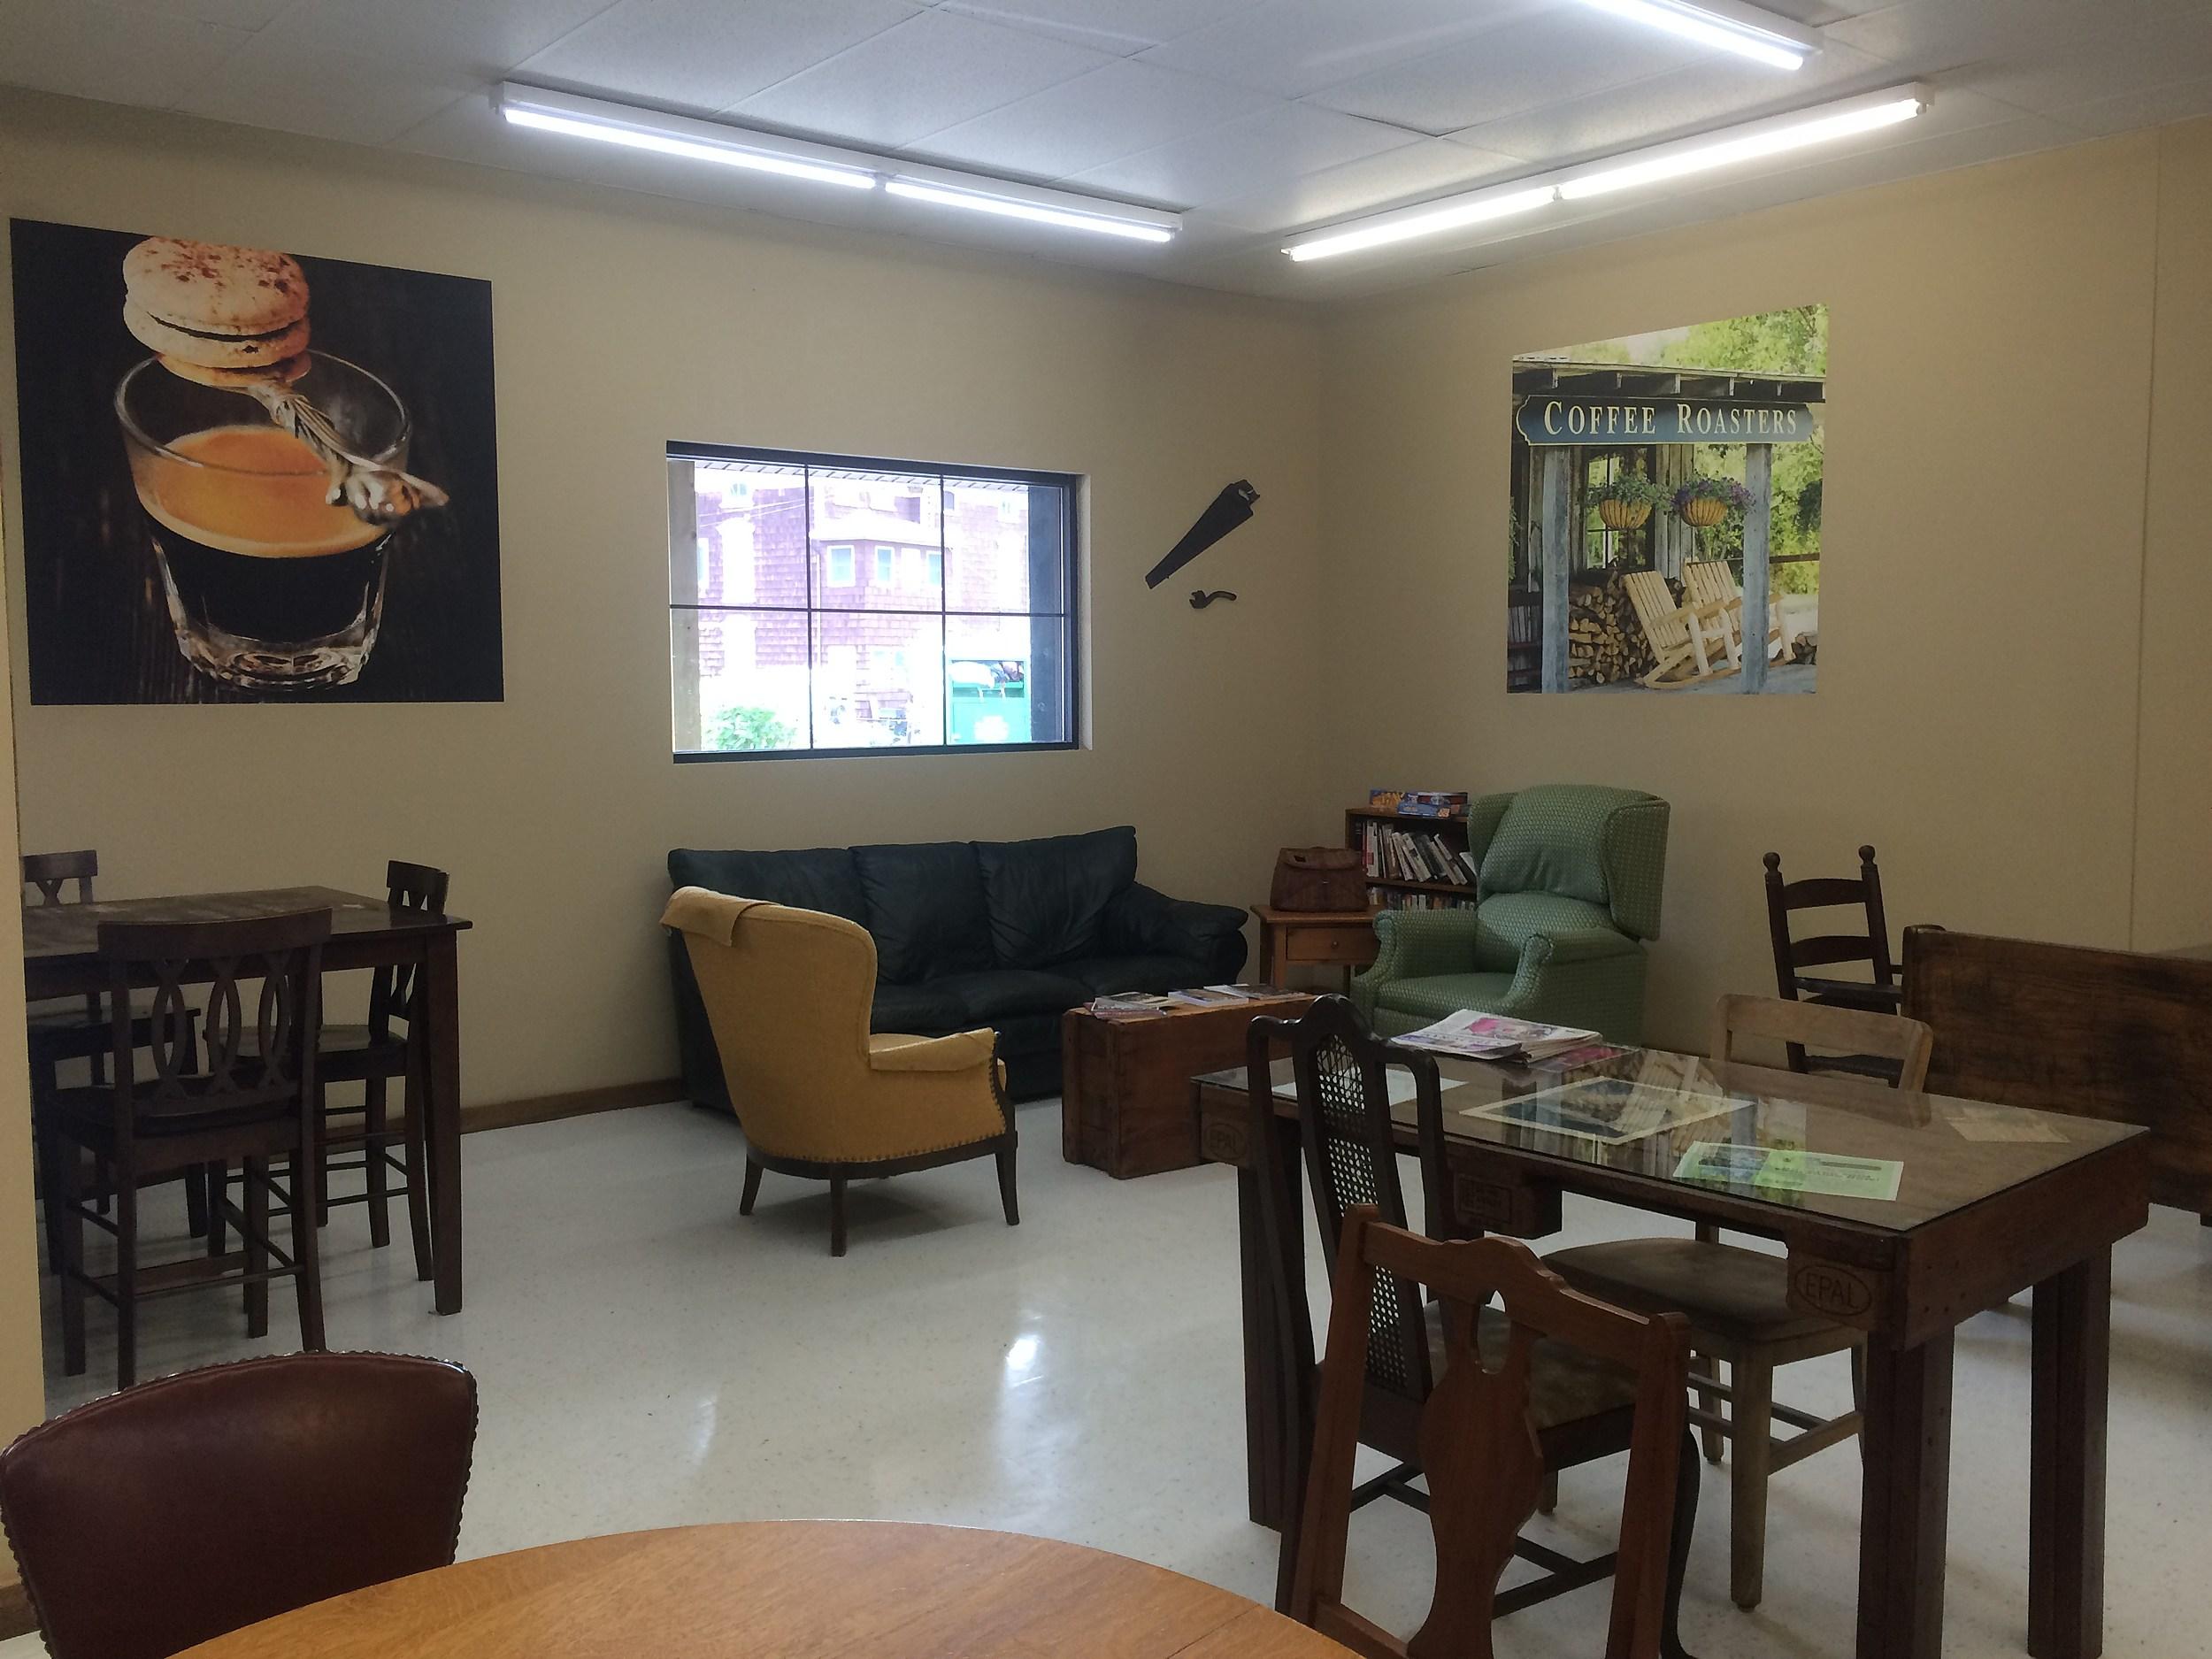 Inside the Moose River Coffee Shop in Ilion